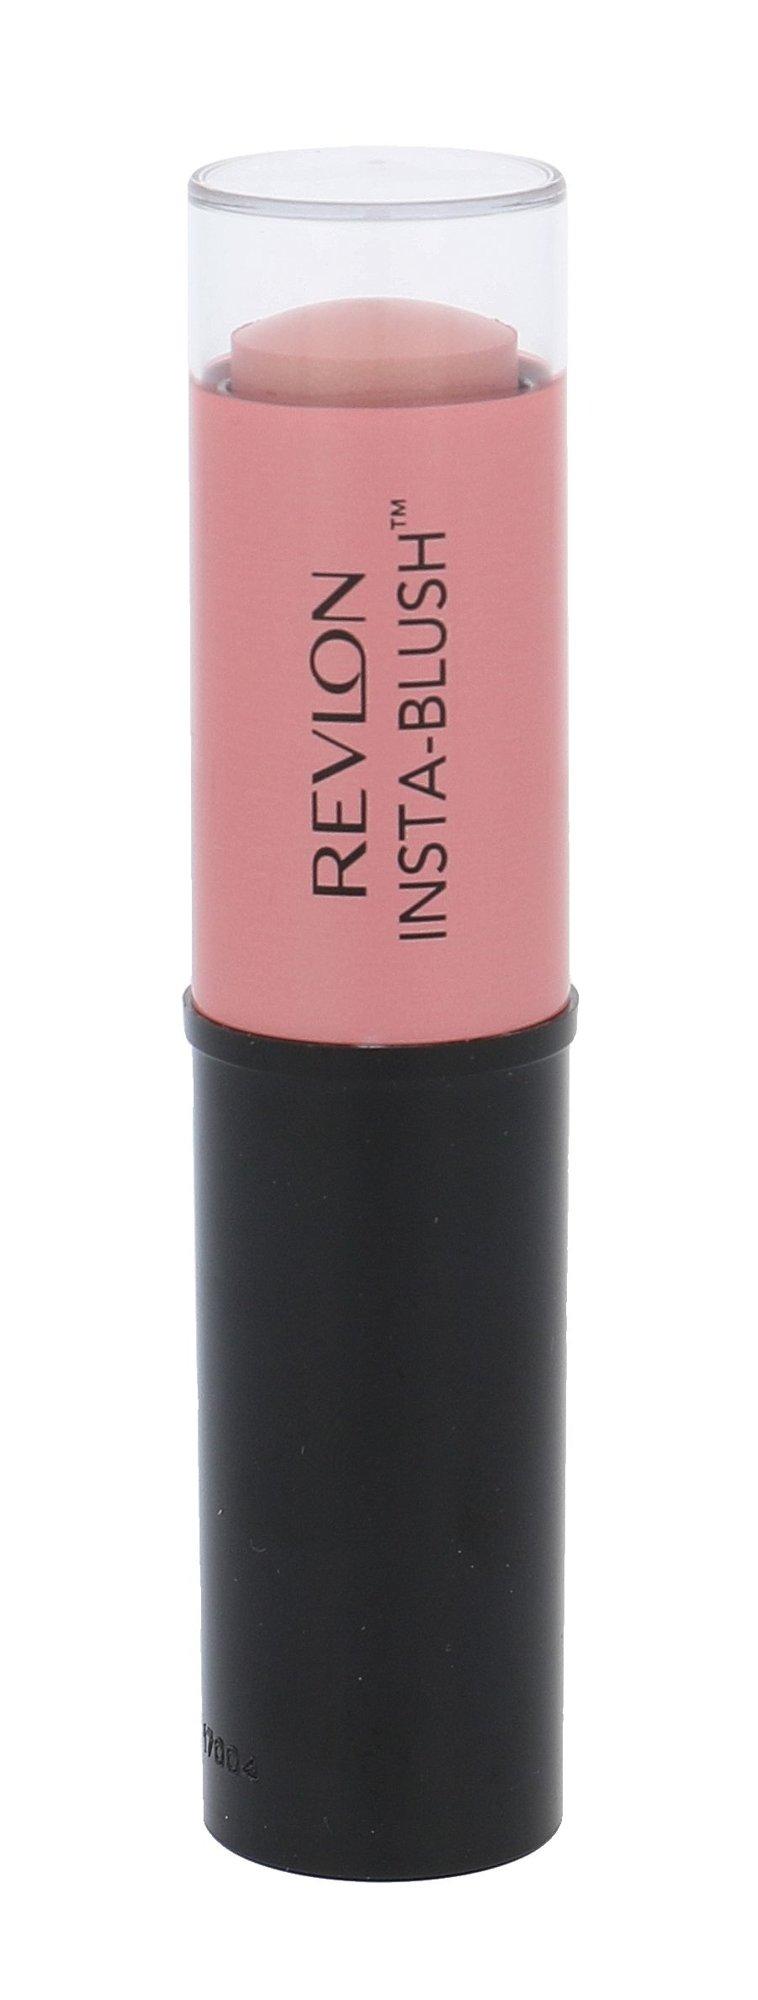 Revlon Insta-Blush Cosmetic 8,9ml 300 Rose Gold Kiss